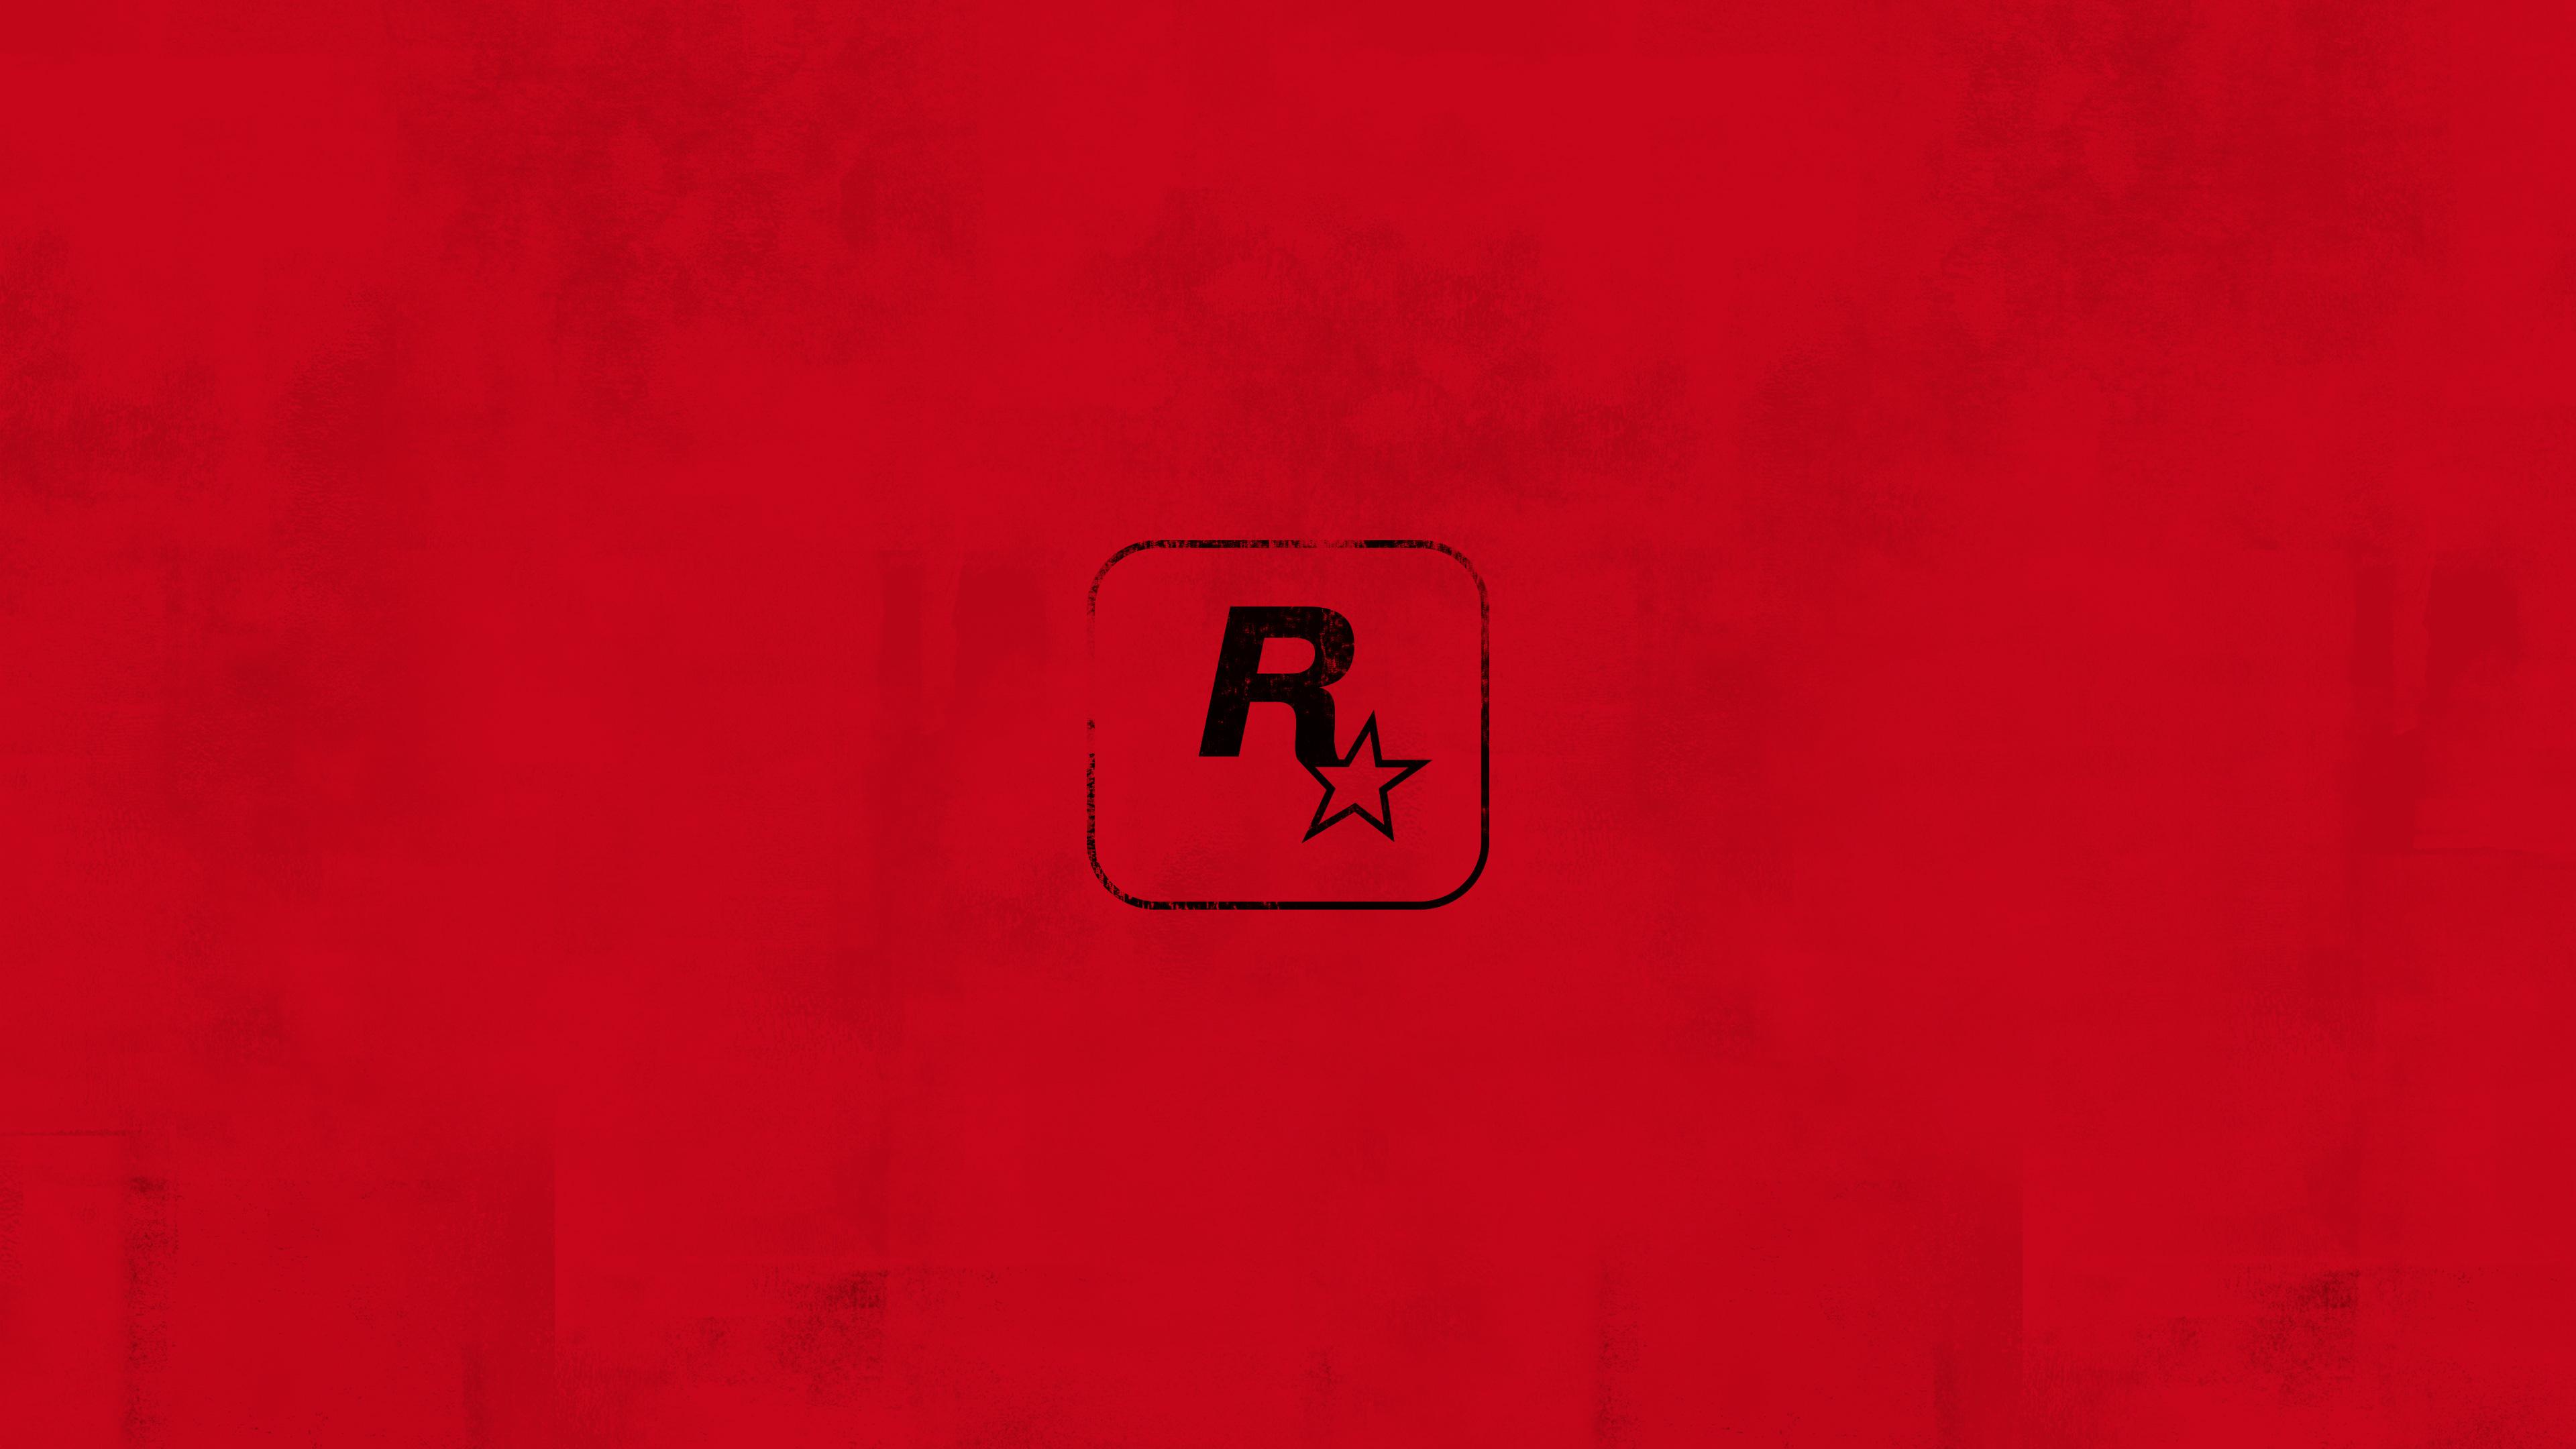 rdr2_rockstar_3840x2160.jpg